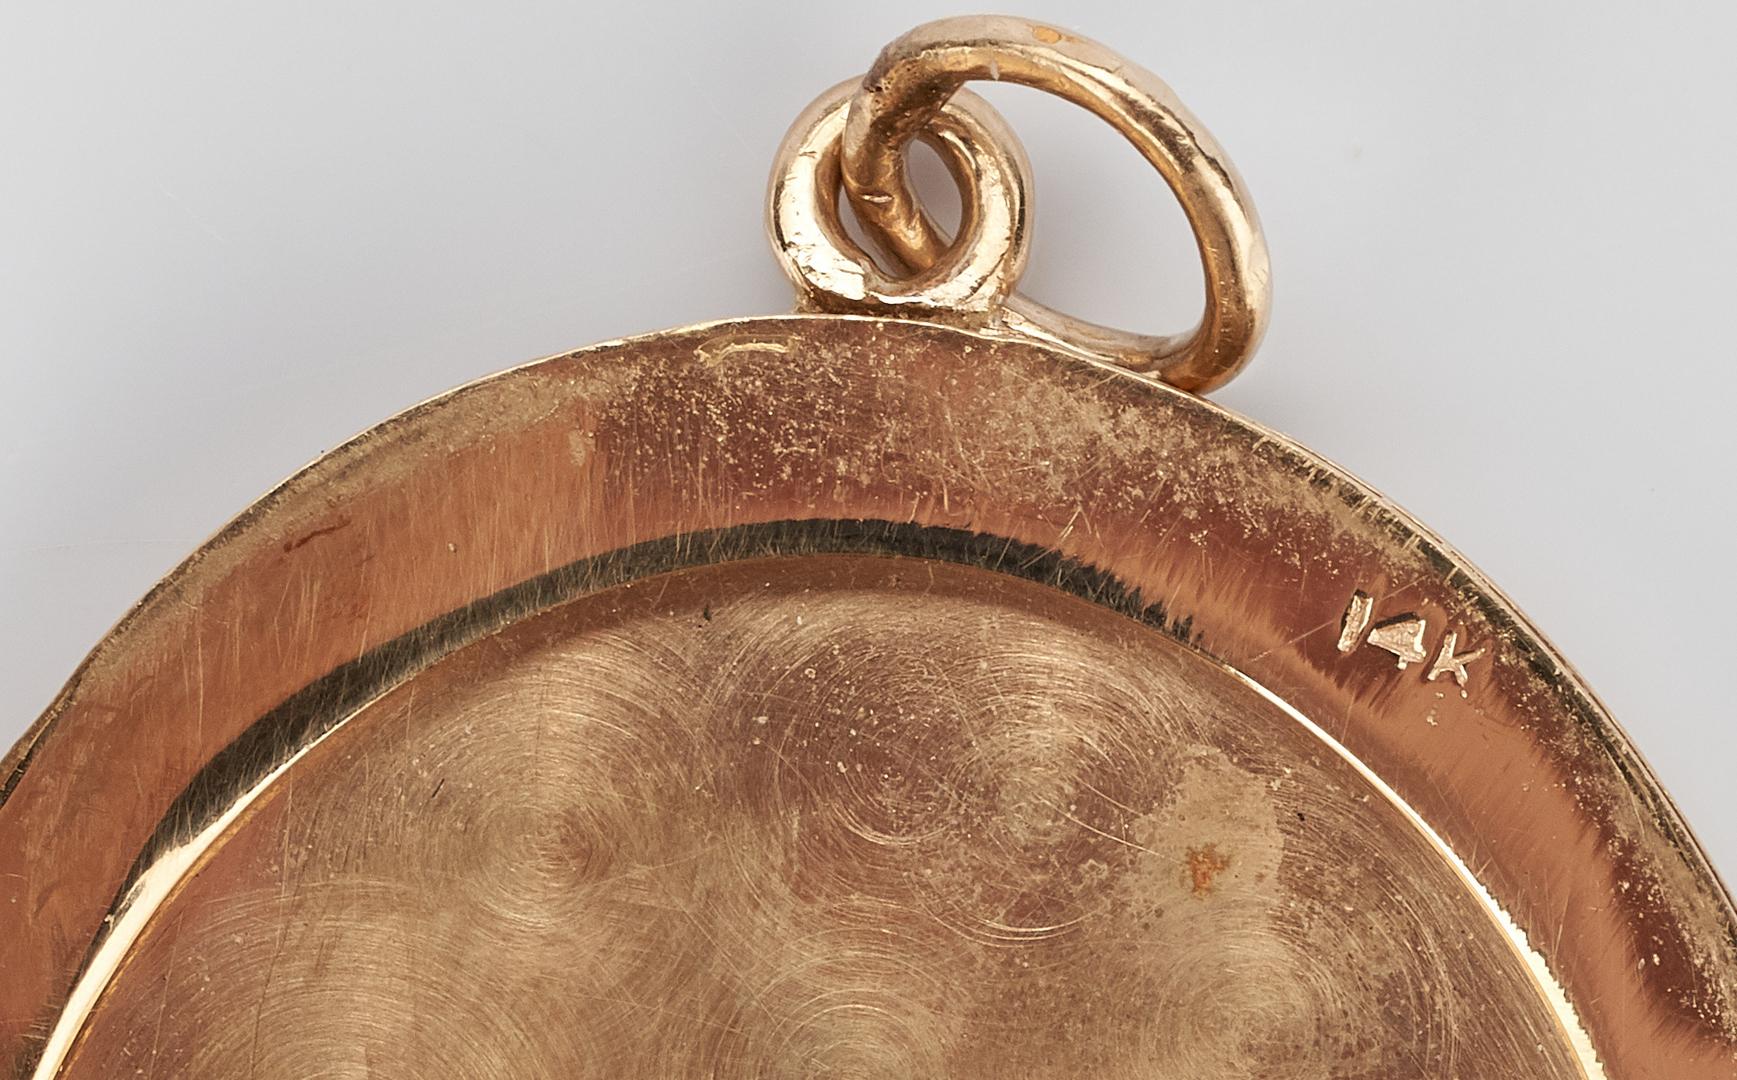 Lot 417: 3 14K Jewelry Items, Money Clip, Pendant, & Watch